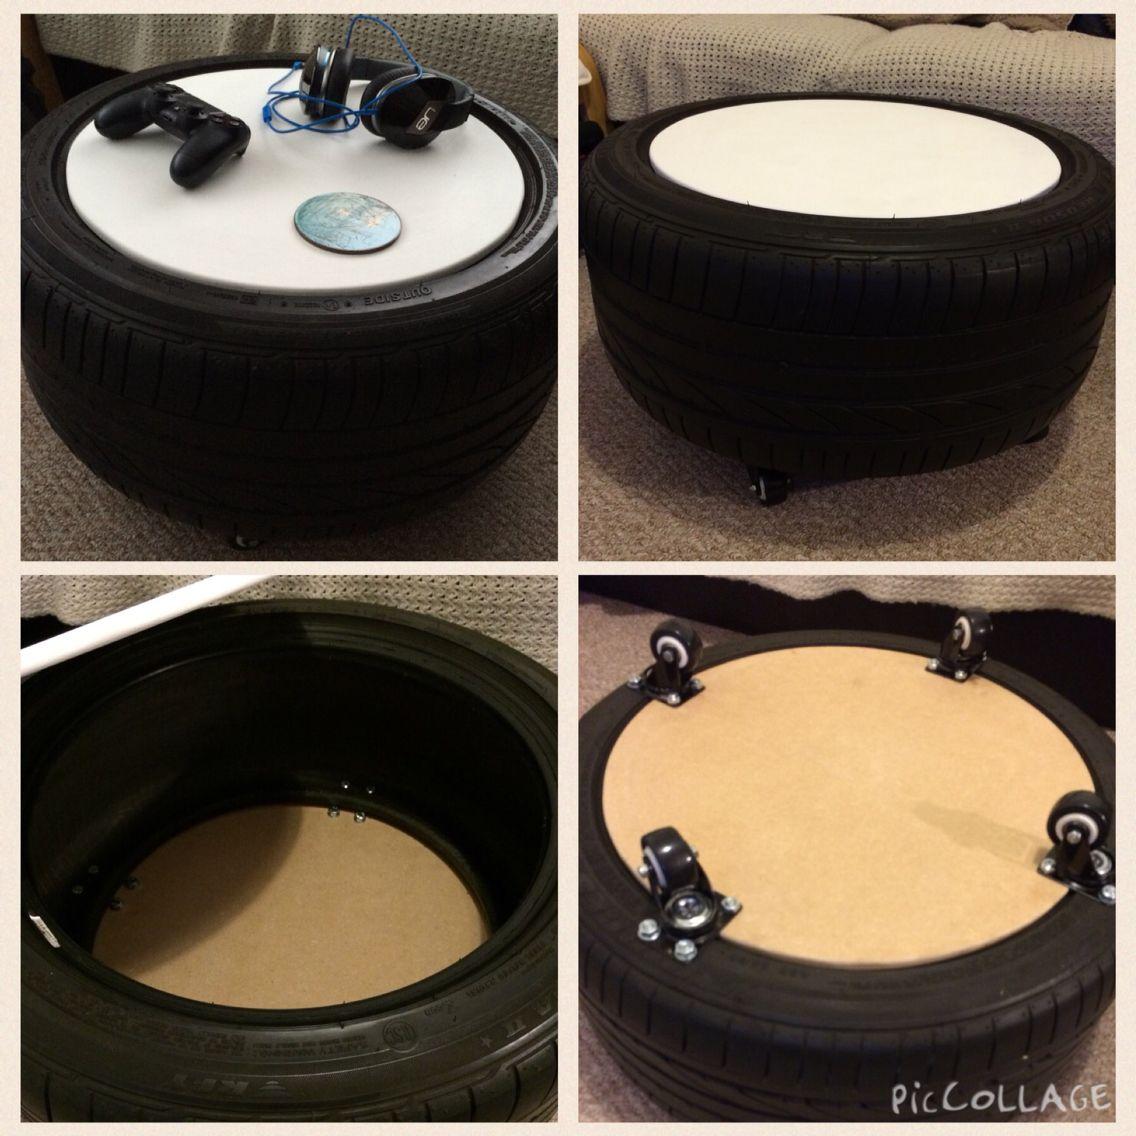 Recycled bridgestone run flat tyre new coffee table on wheels recycled bridgestone run flat tyre new coffee table on wheels with internal storage geotapseo Image collections